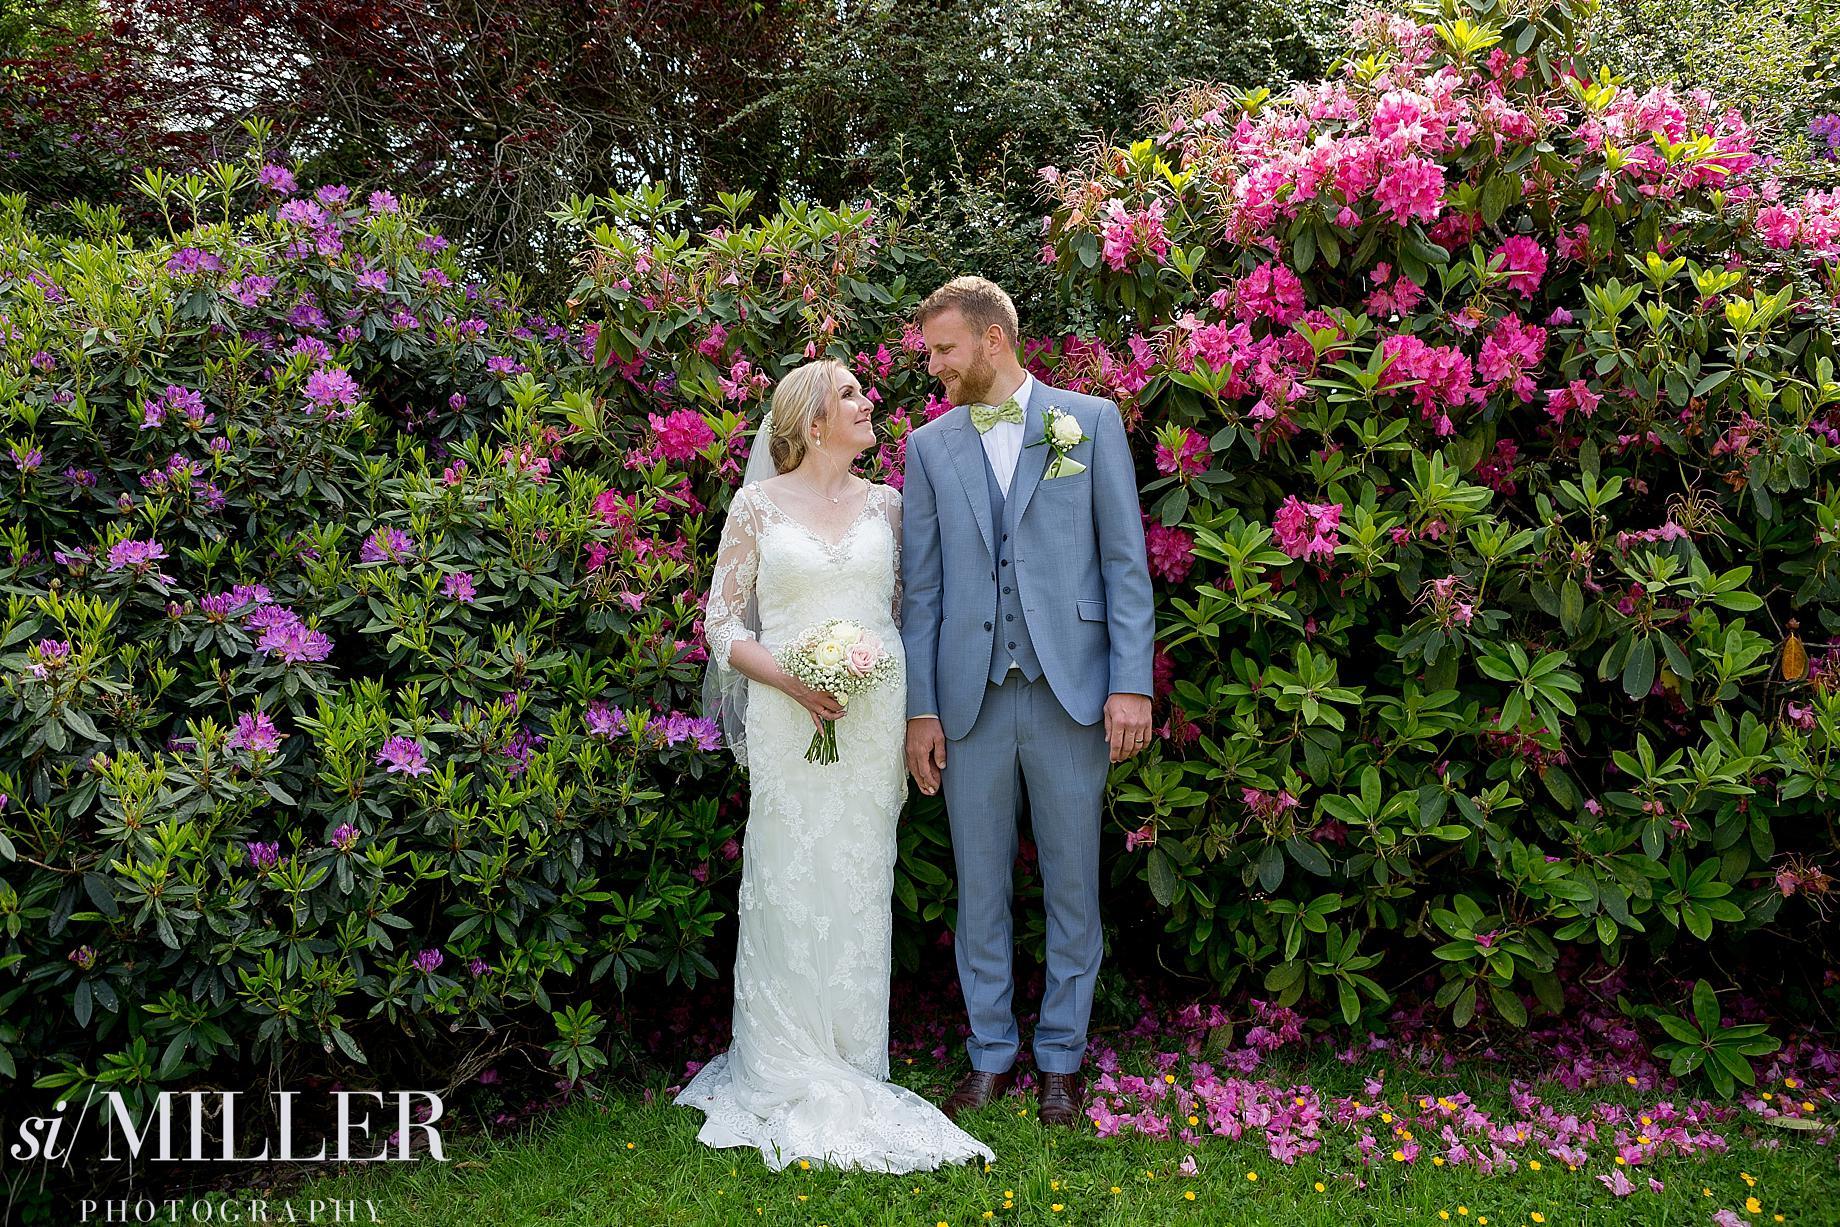 Ferraris wedding photographer Lancashire. Documentary wedding photography by wedding photographer preston